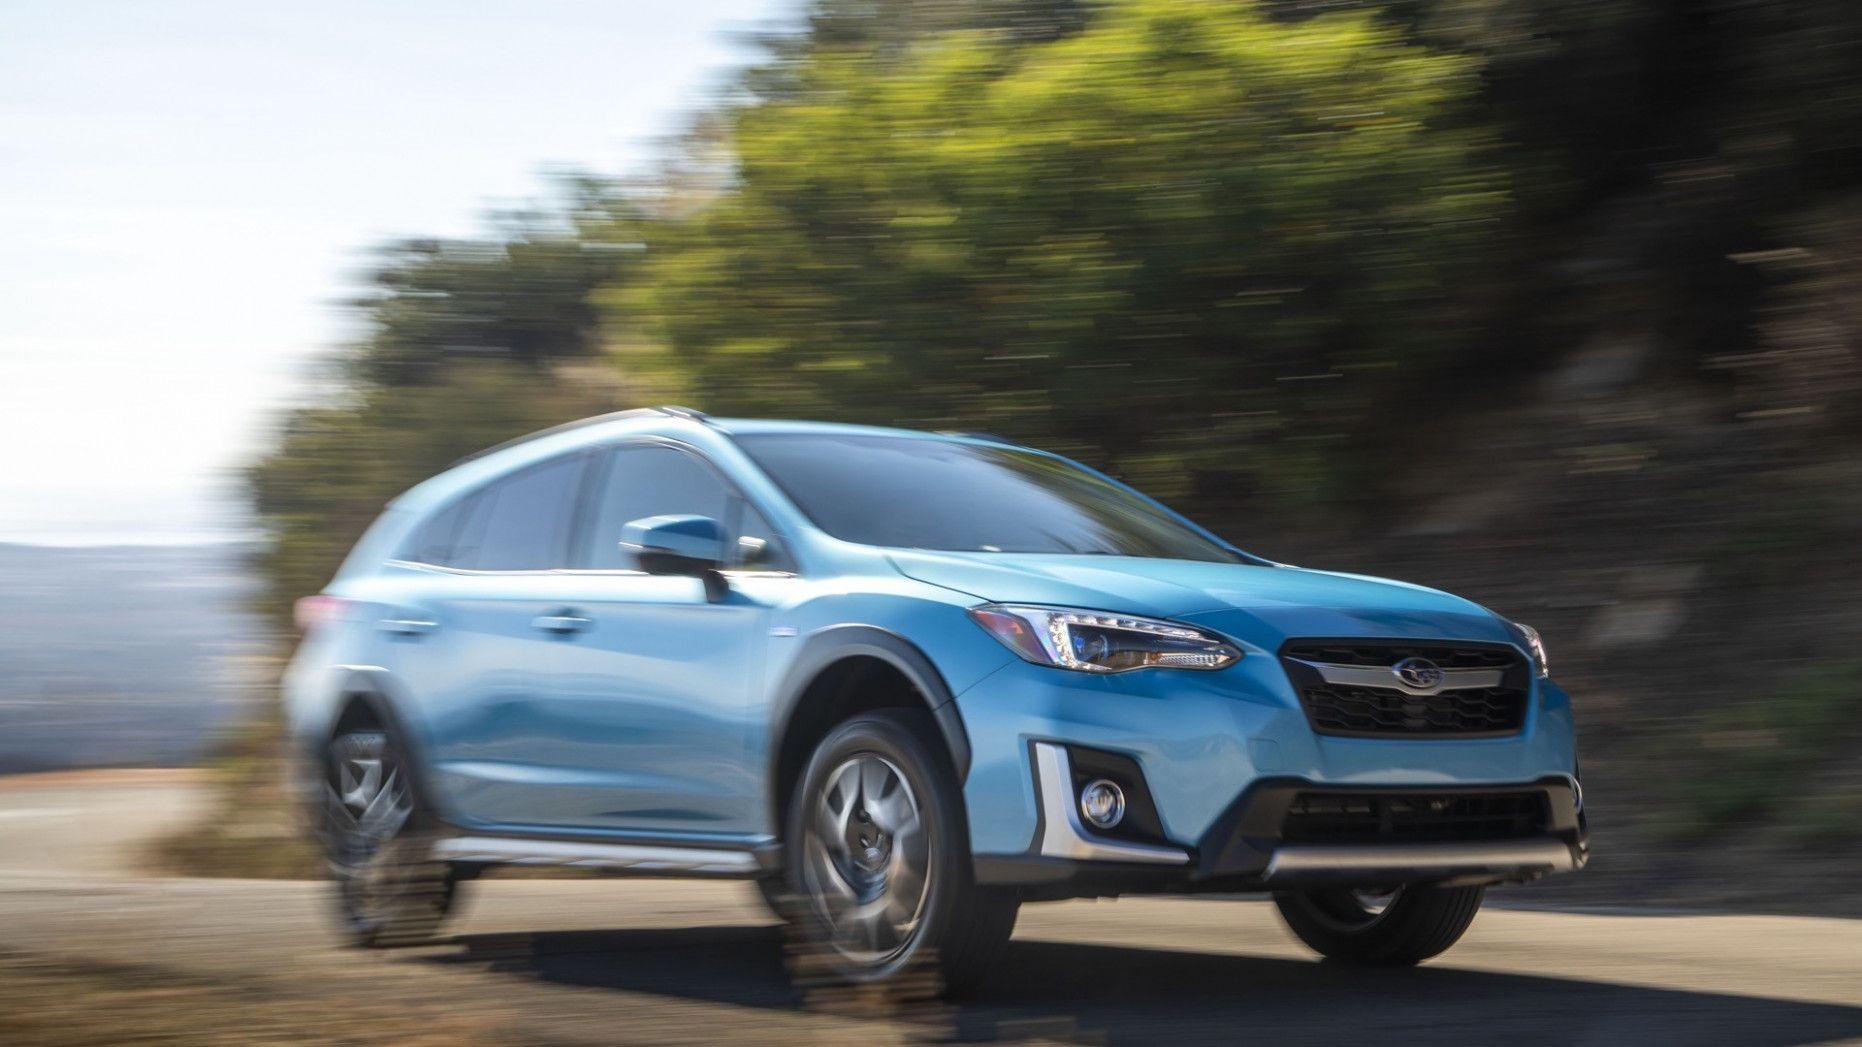 9 Picture 2020 Subaru Electric In 2020 Subaru Crosstrek Subaru Plug In Hybrid Suv